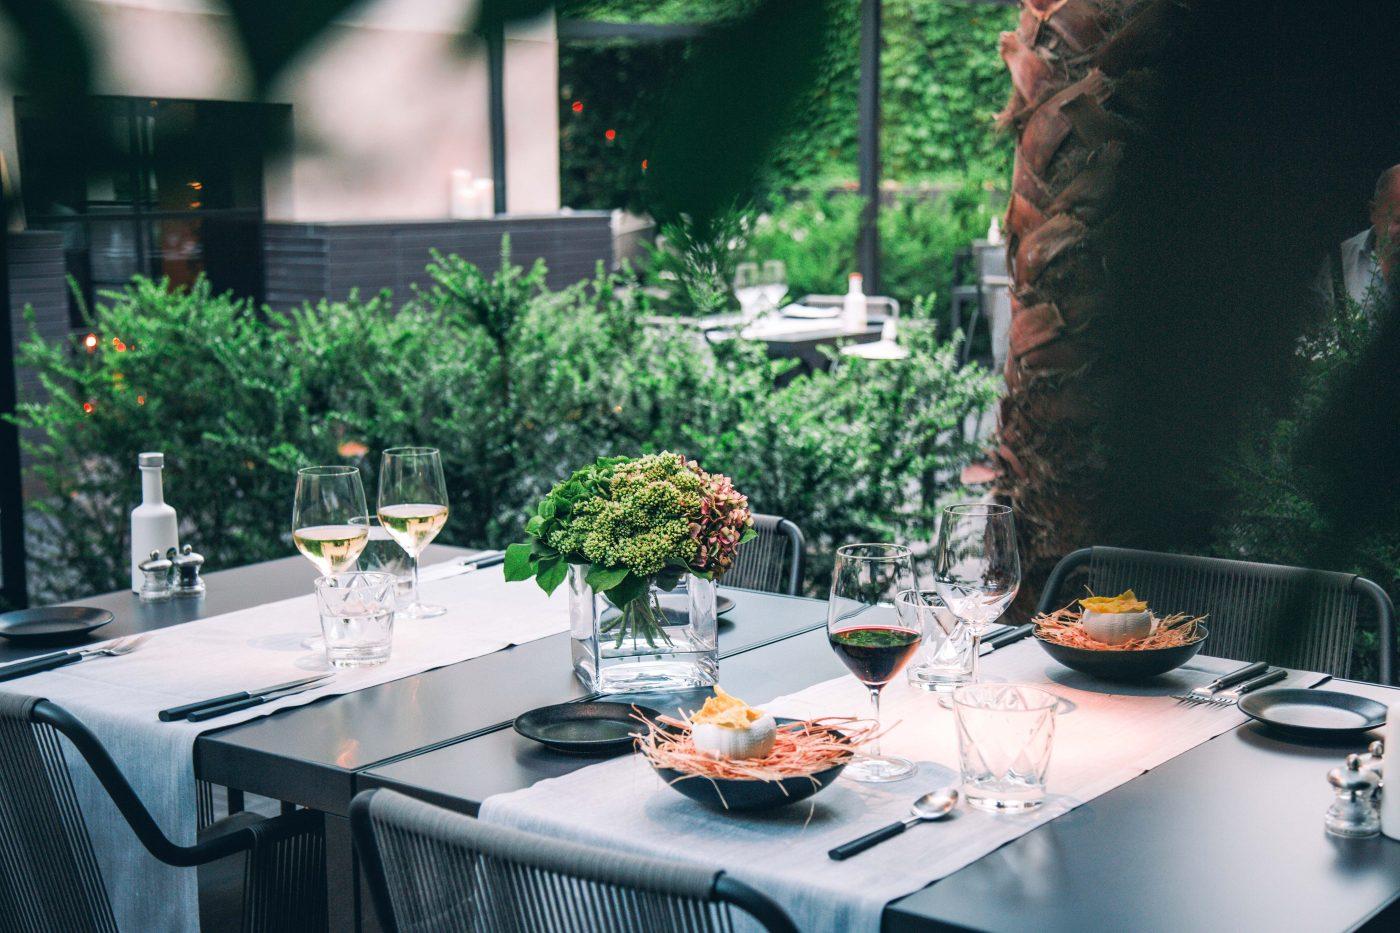 Landgang Palma de Mallorca: Lunch im Quadrat